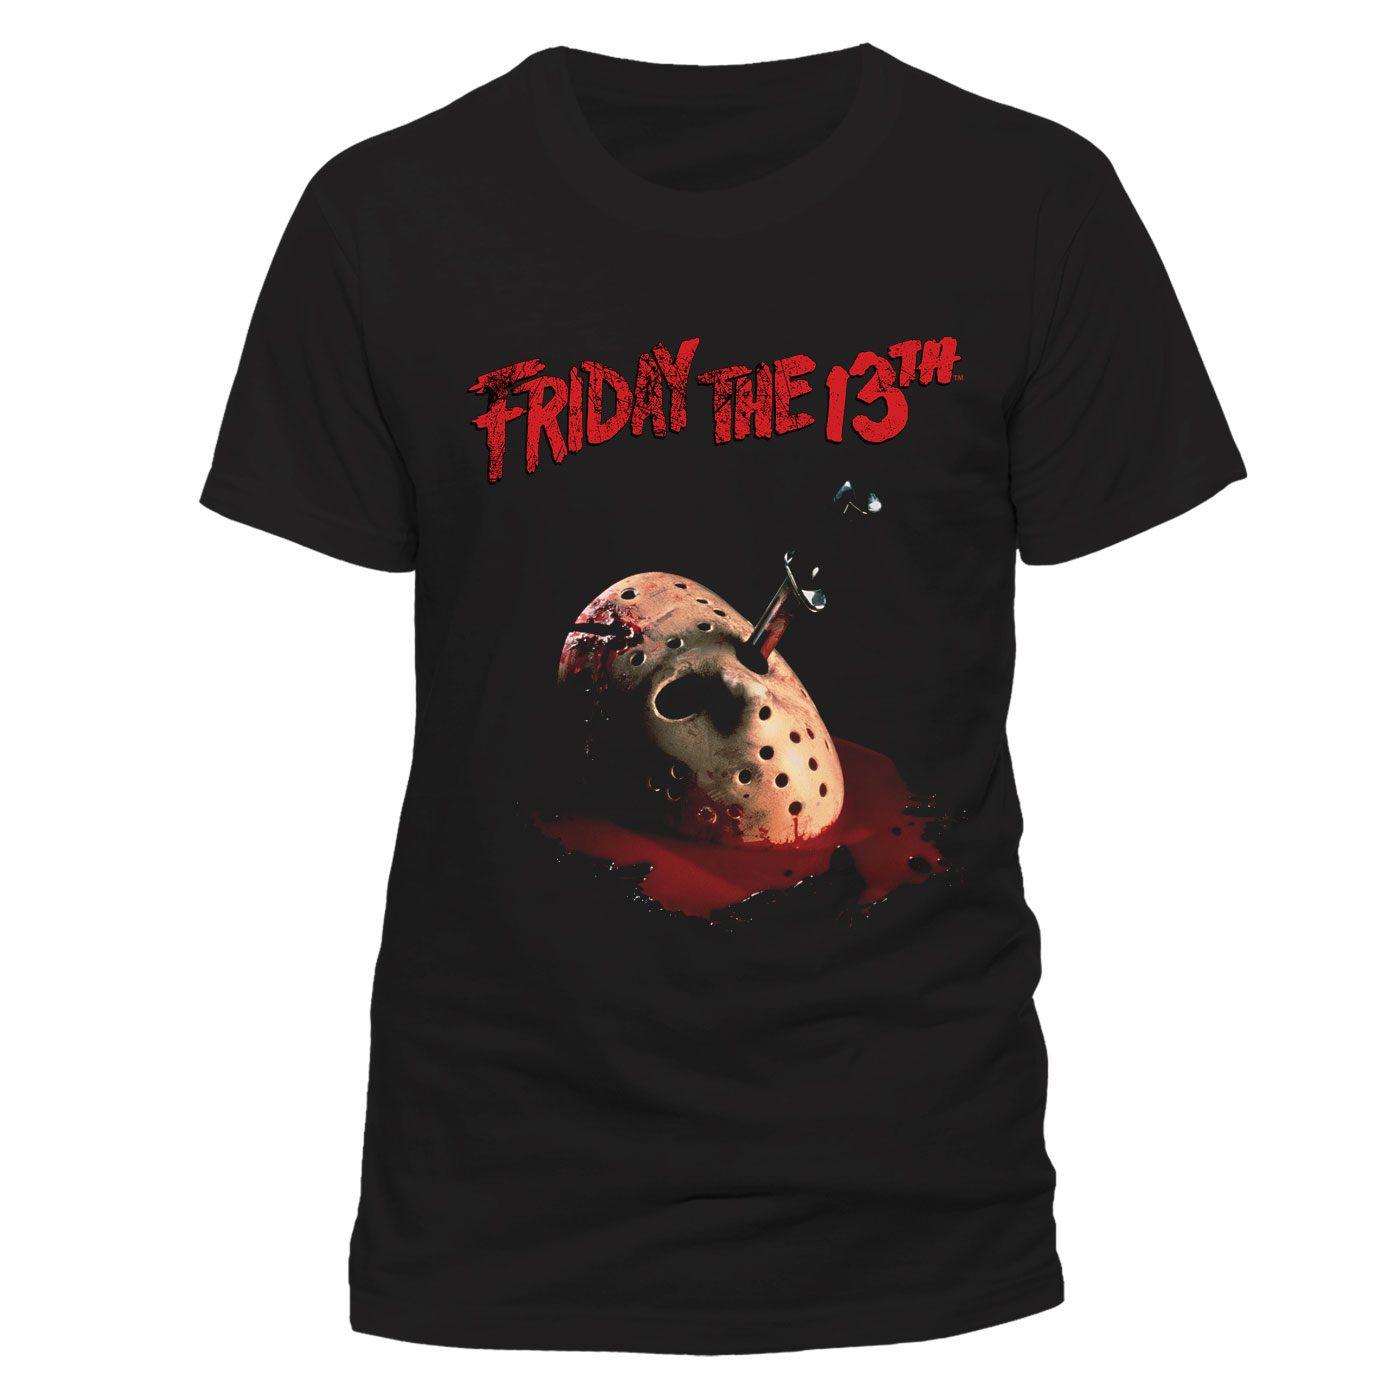 Friday the 13th T-Shirt Dagger Size XL